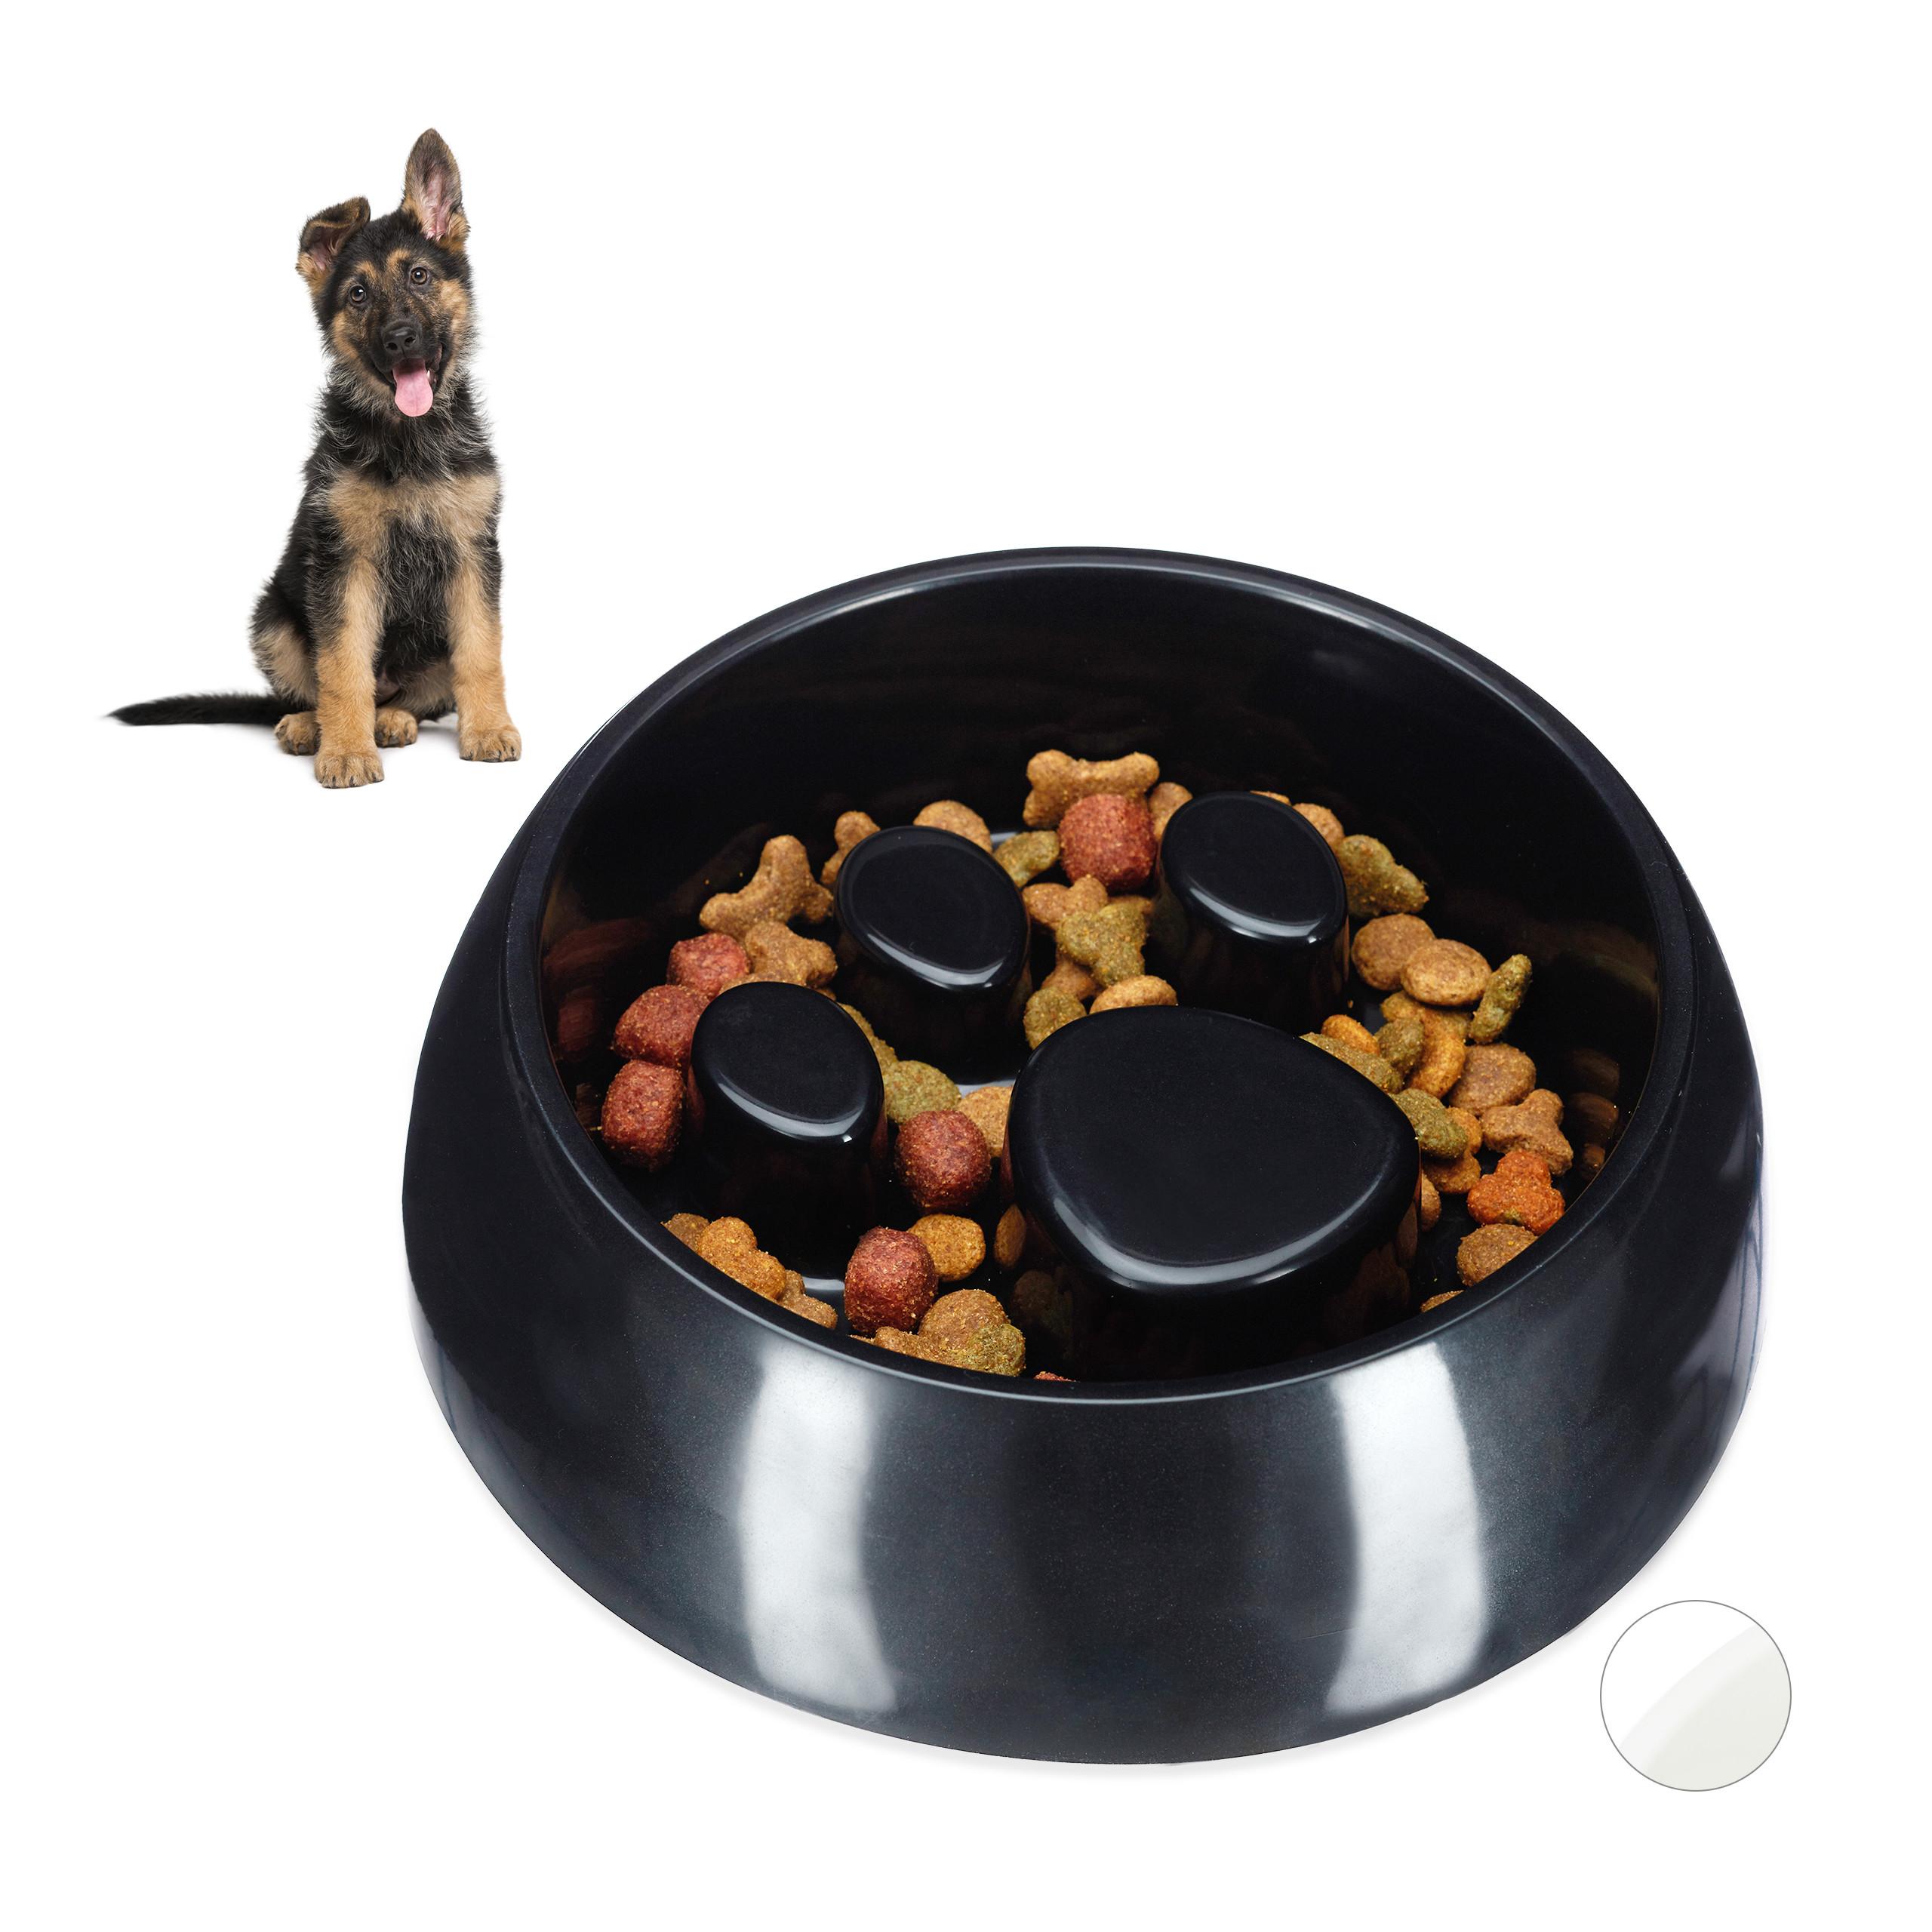 Indexbild 8 - Anti Schling Napf Hundenapf Großer Fressnapf Langsames Fressen Futternapf rund